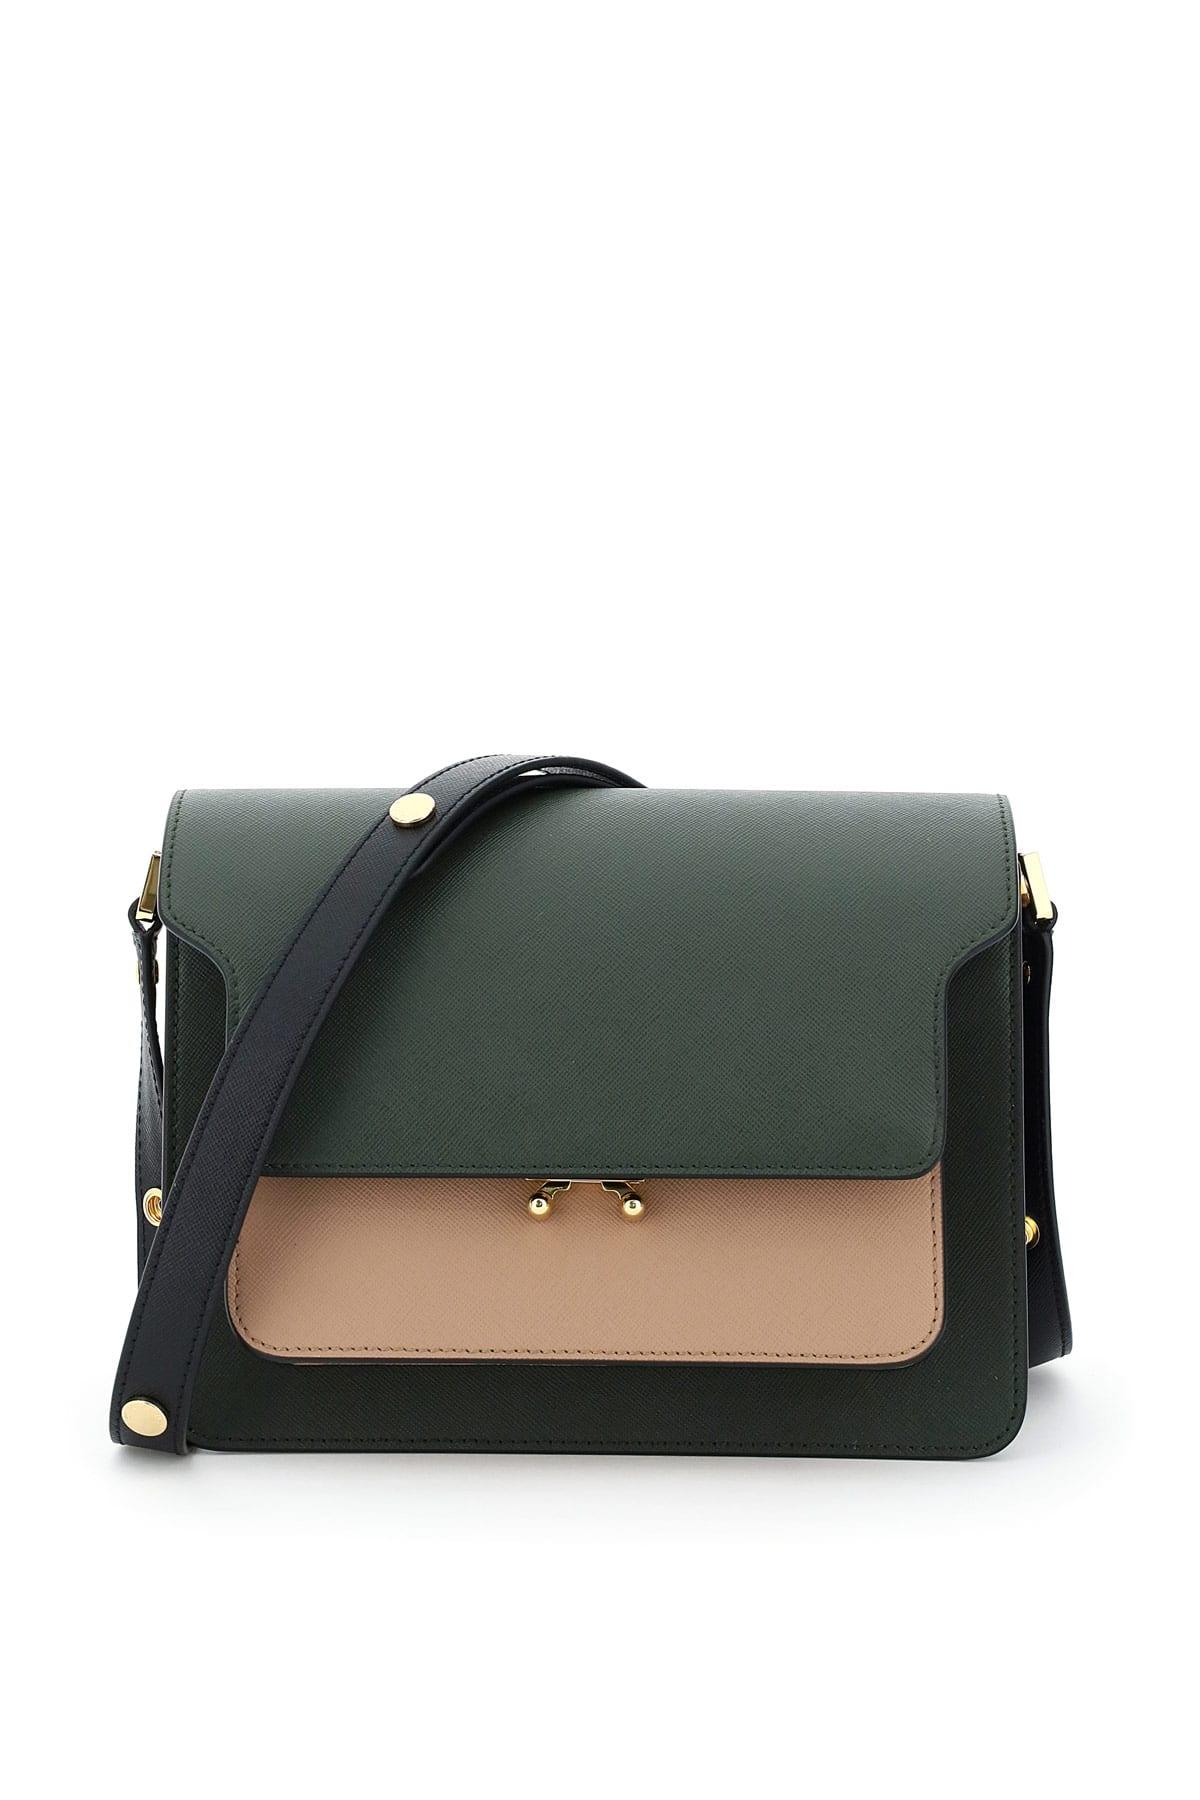 MARNI TRUNK BAG OS Green, Brown, Black Leather